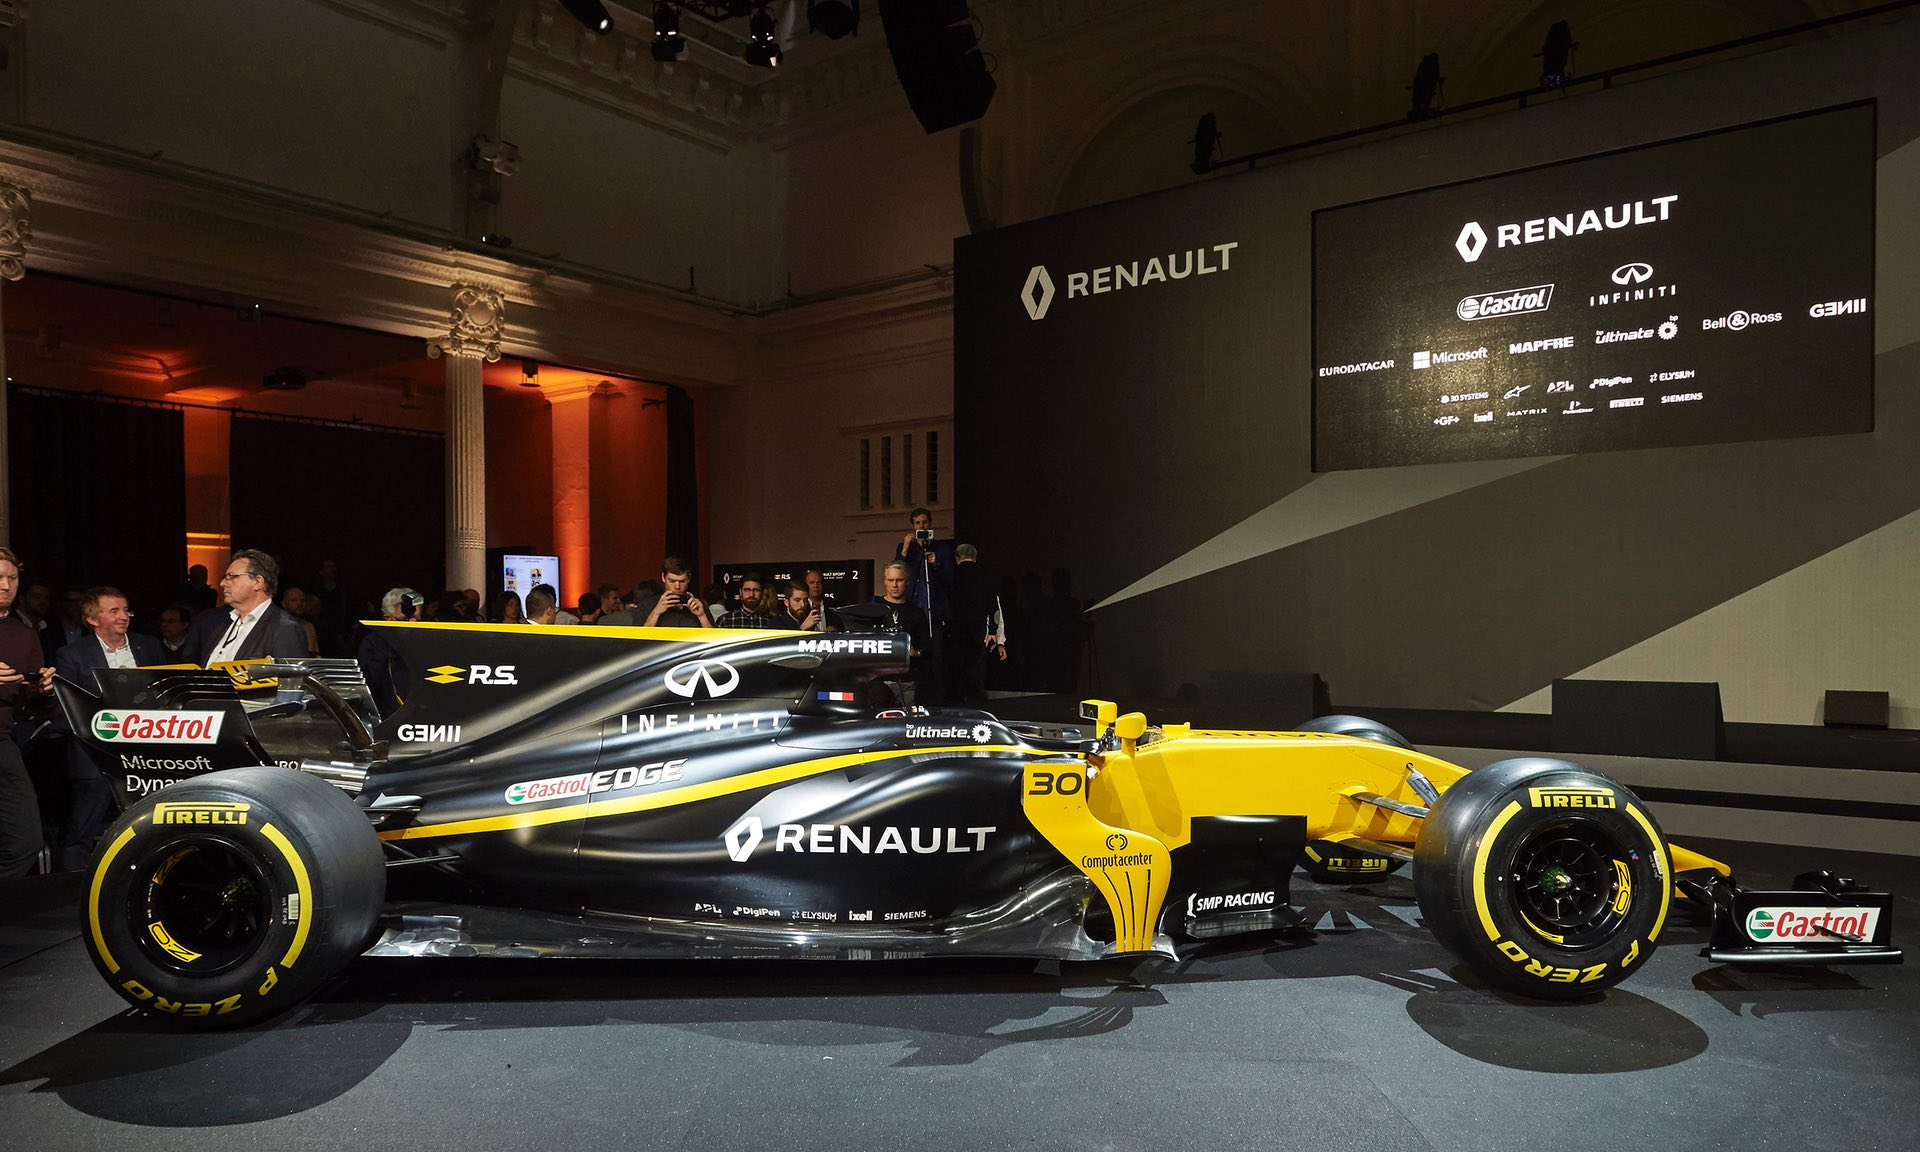 2017 f1 car